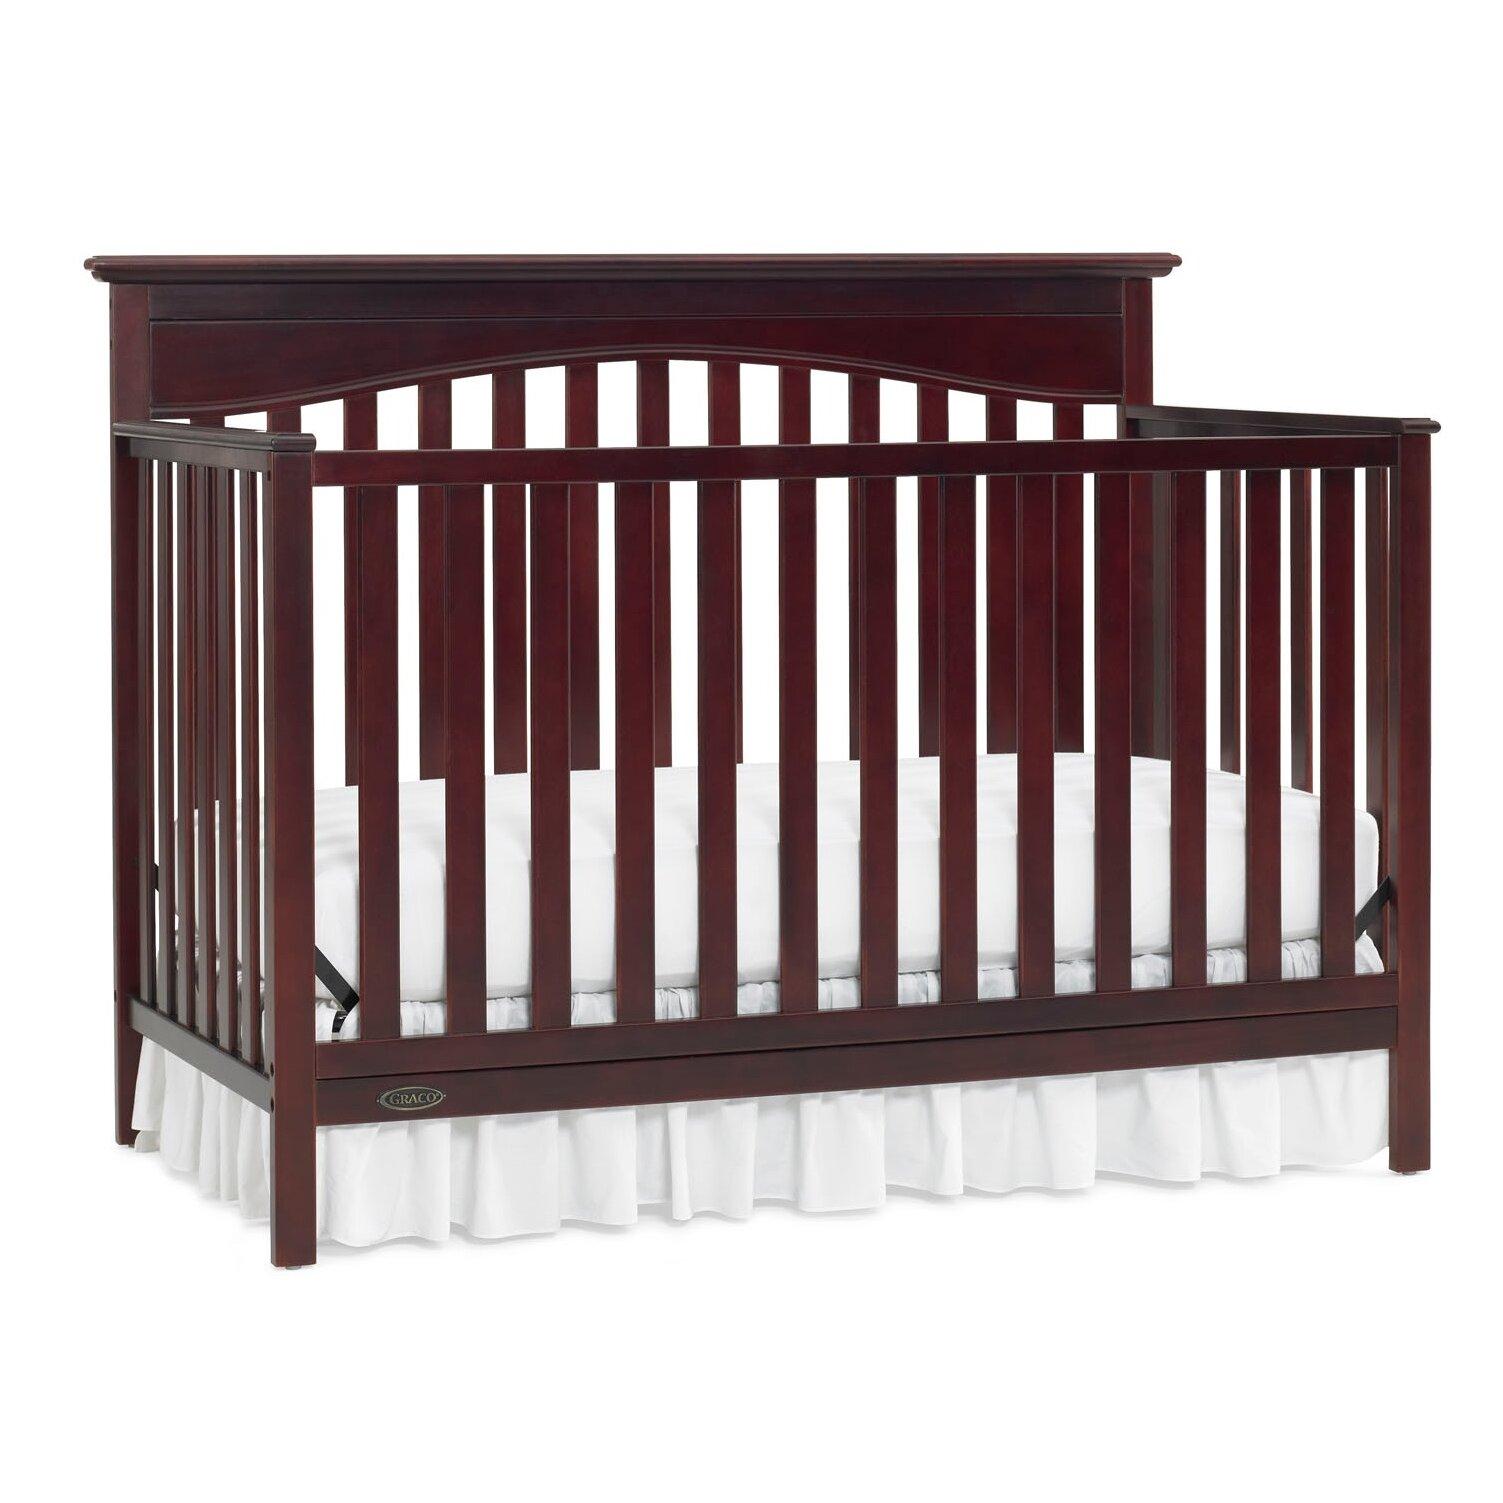 Graco Convertible Crib Parts Prod 1446724812 Hei 333 Wid